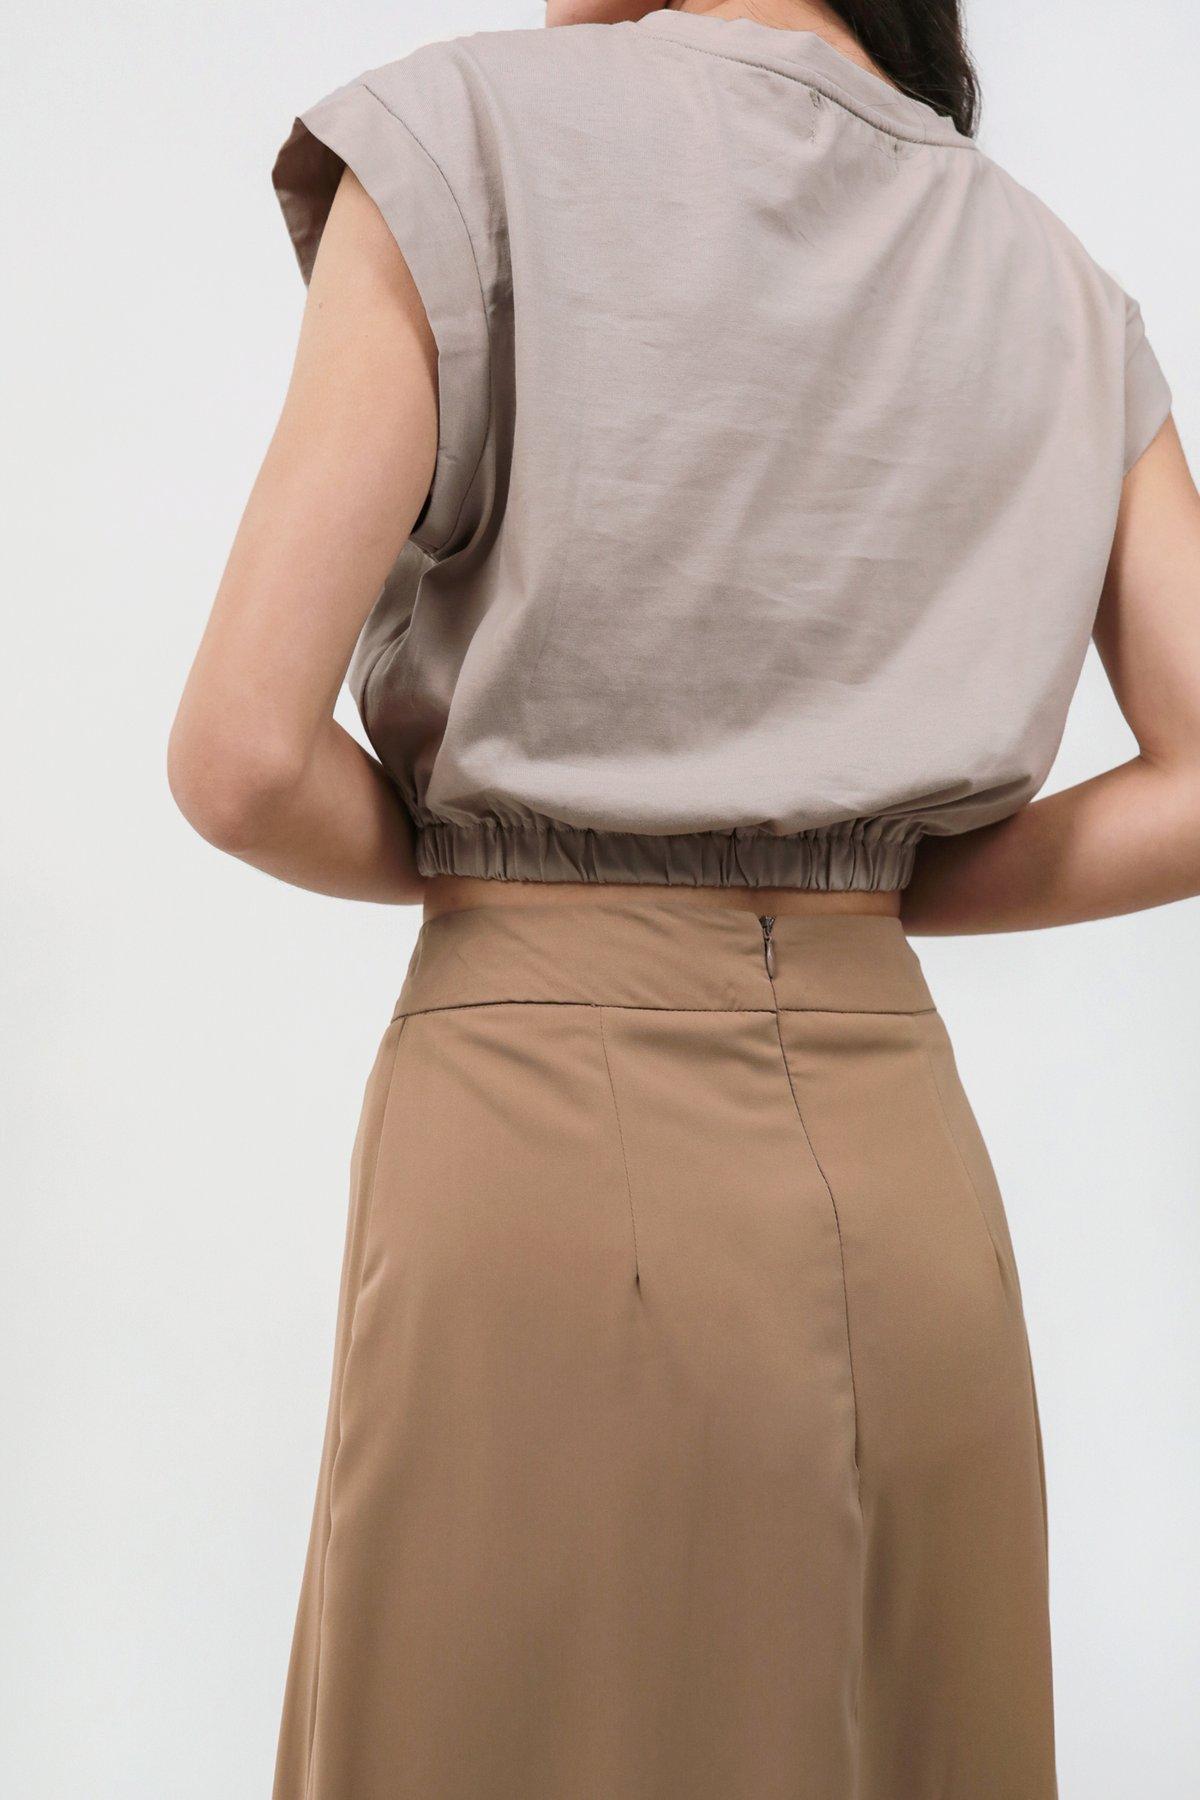 Issa Skirt (Brown)